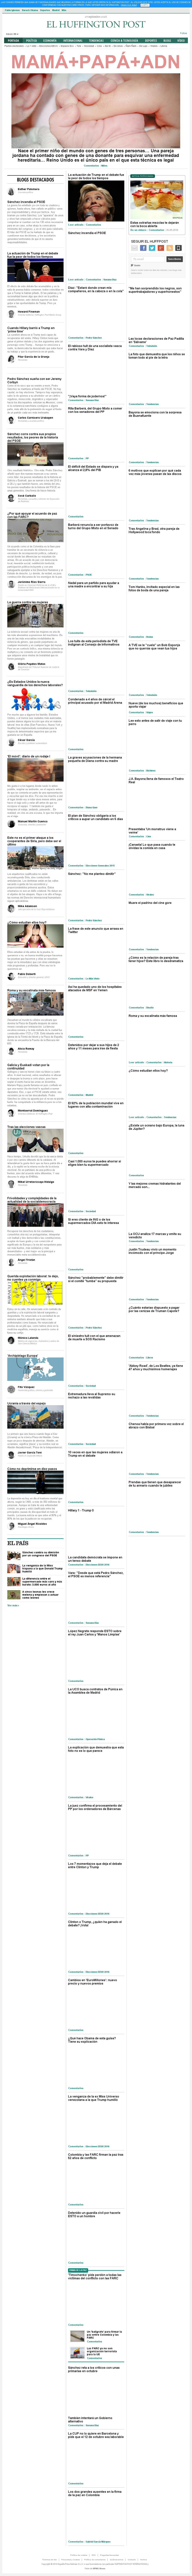 El Huffington Post (Spain) at Tuesday Sept. 27, 2016, 4:06 p.m. UTC